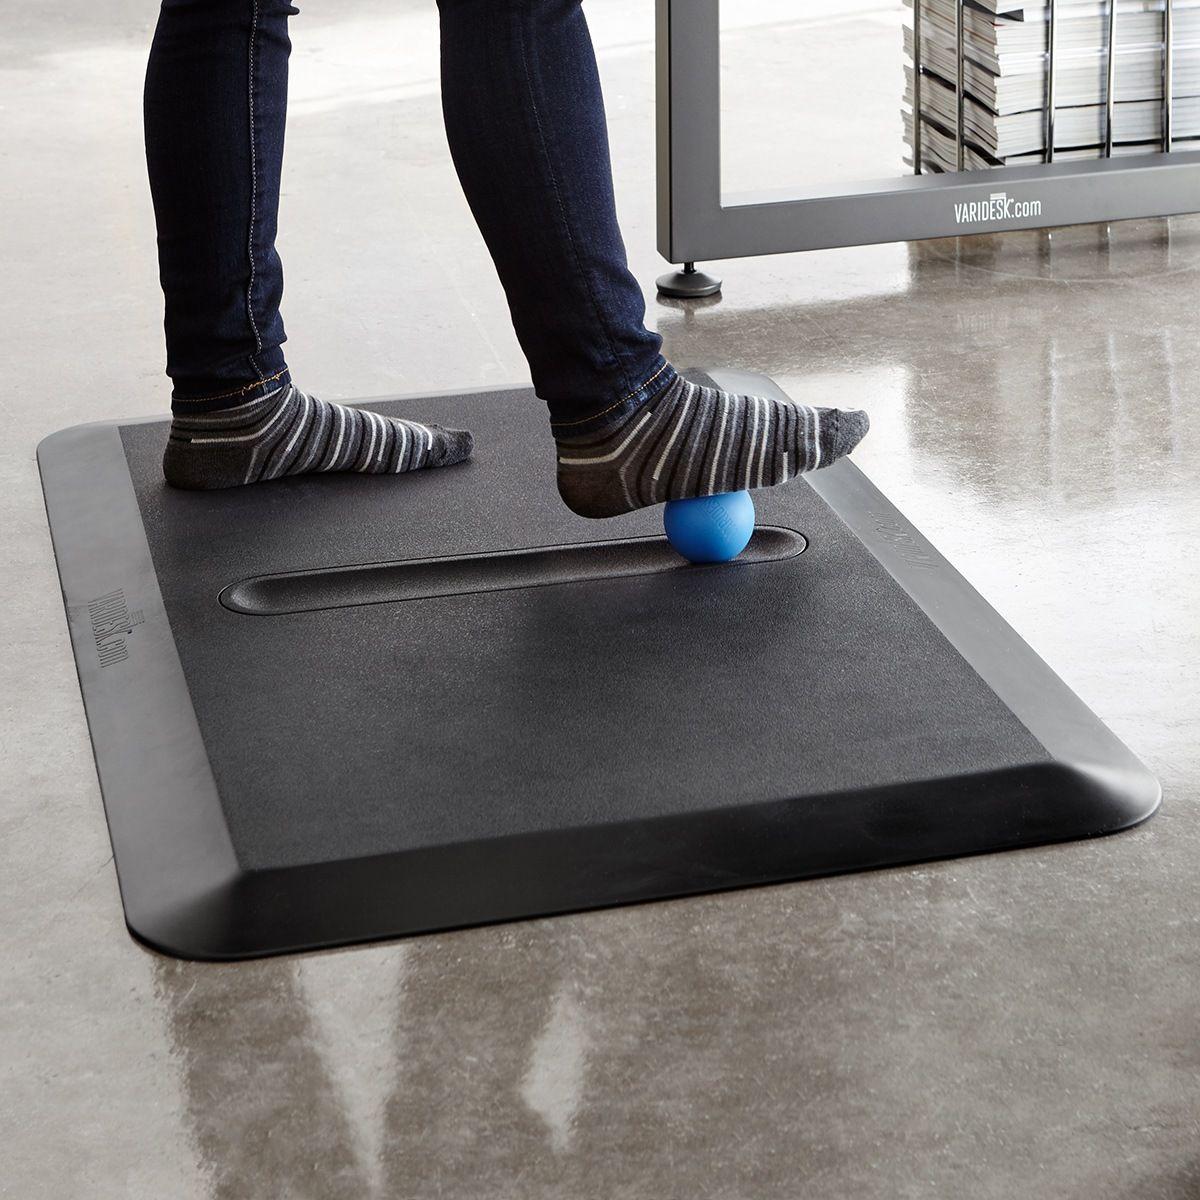 Varidesk Anti Fatigue Floor Mat Activemat Groove Standing Desk Mat Varidesk Desk Mat